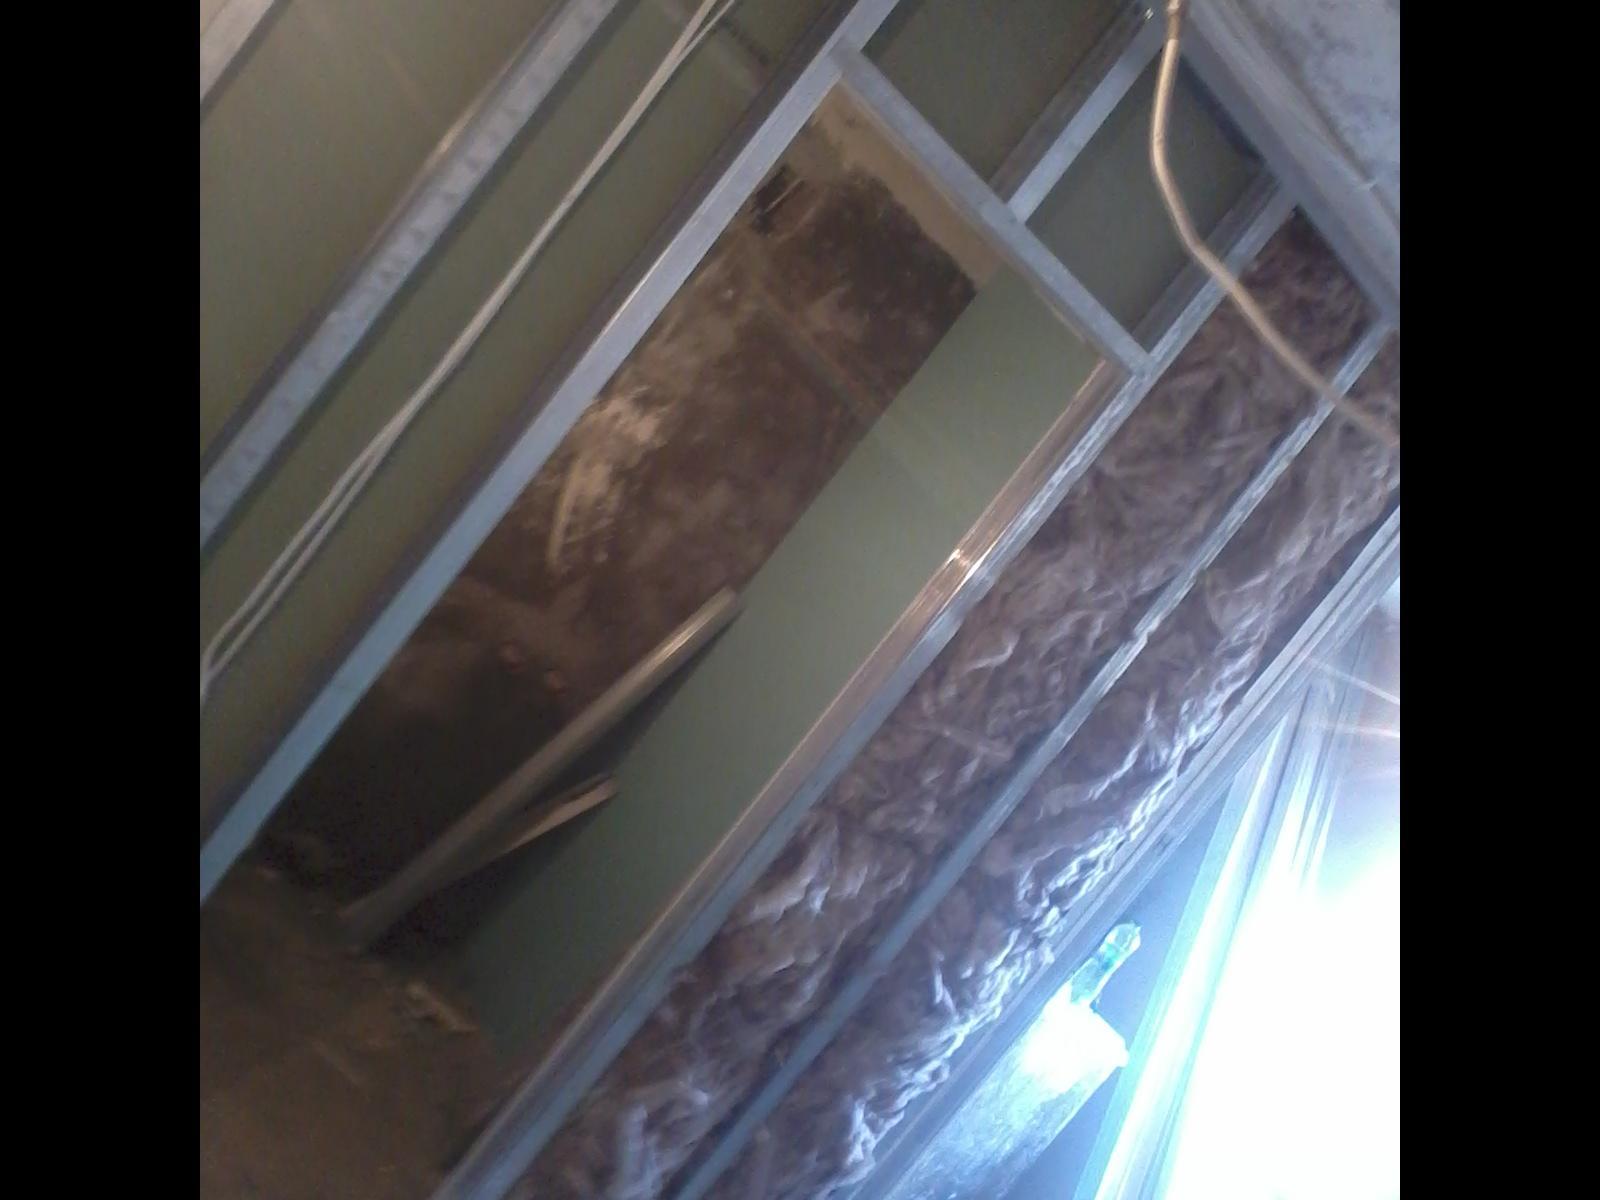 Фото монтаж перегородки с гибсокартона внутри с мин.ватой для шумоизоляции